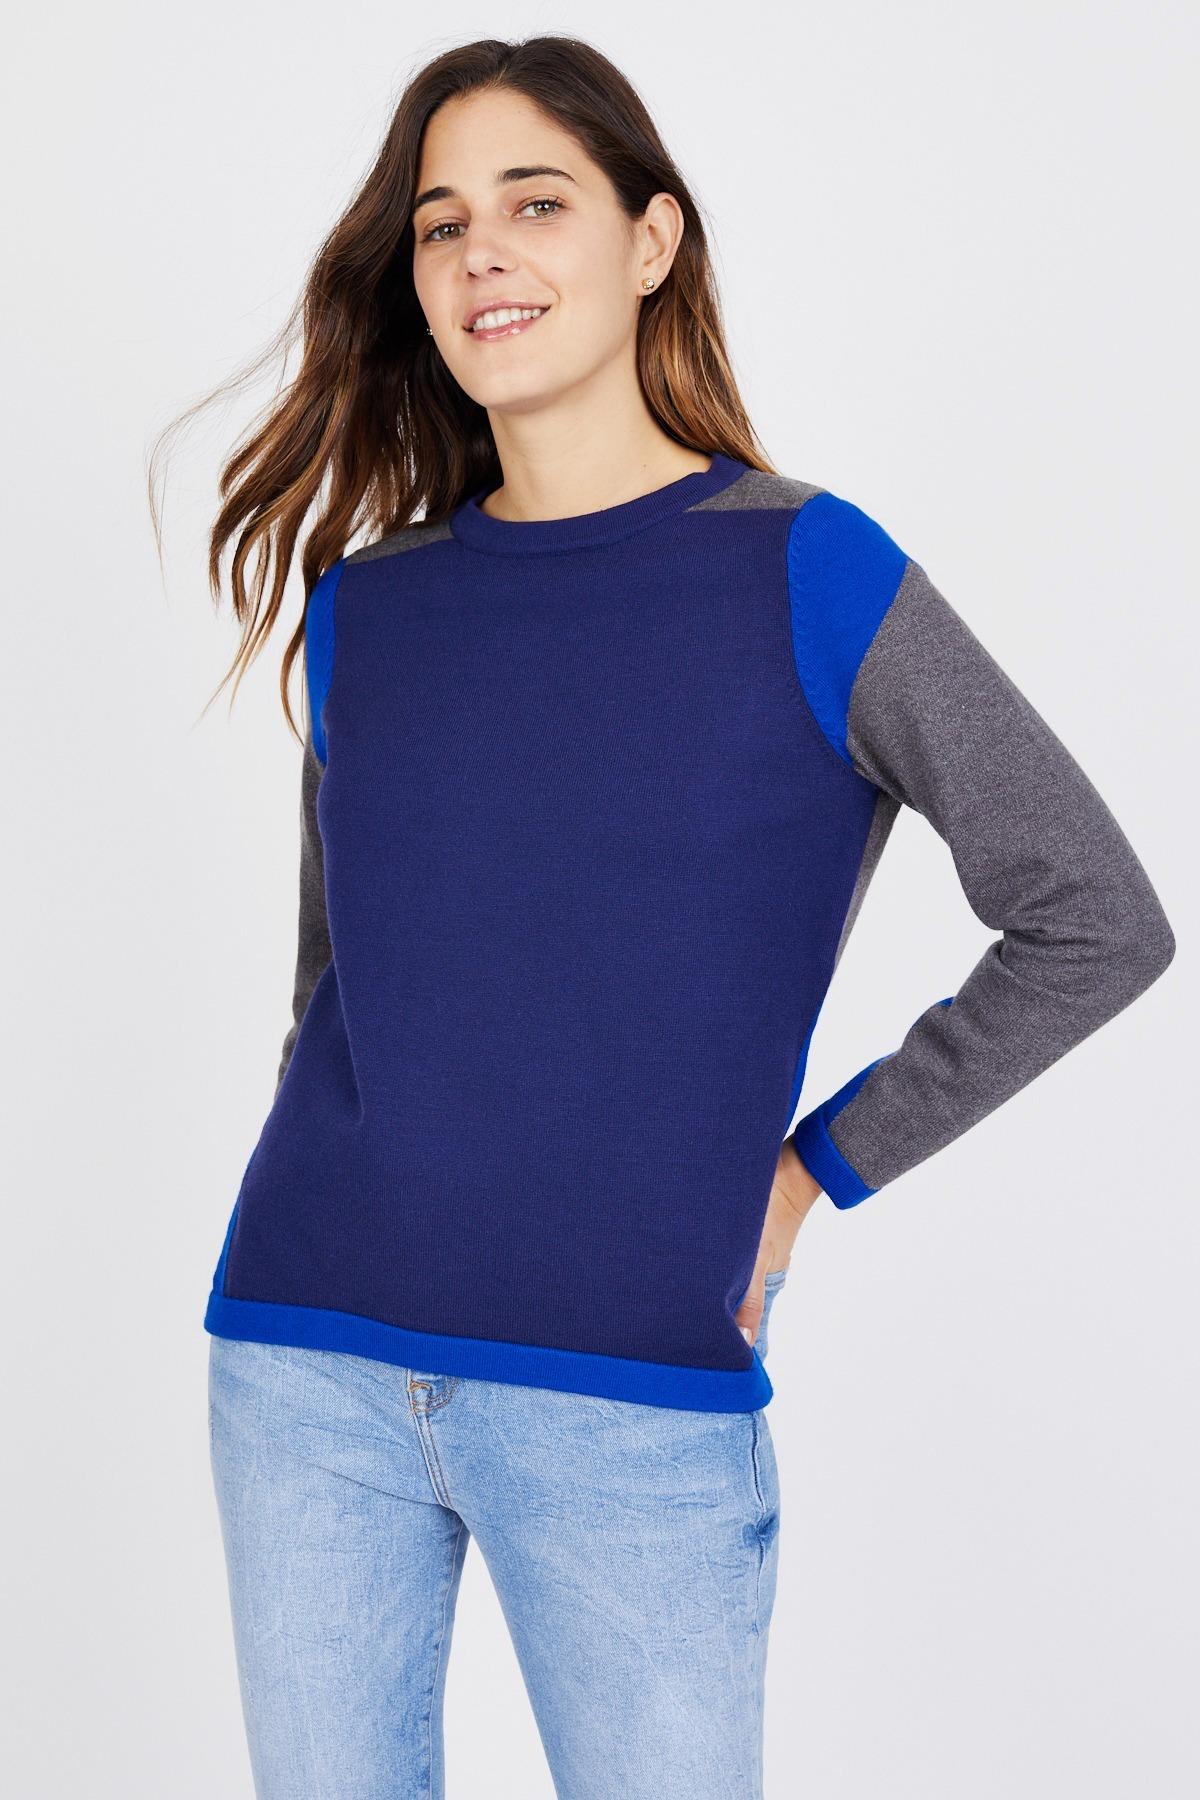 2b9de27c8eff Color Block Crewneck Sweater by Summer   Sage - Rent Clothes with Le ...